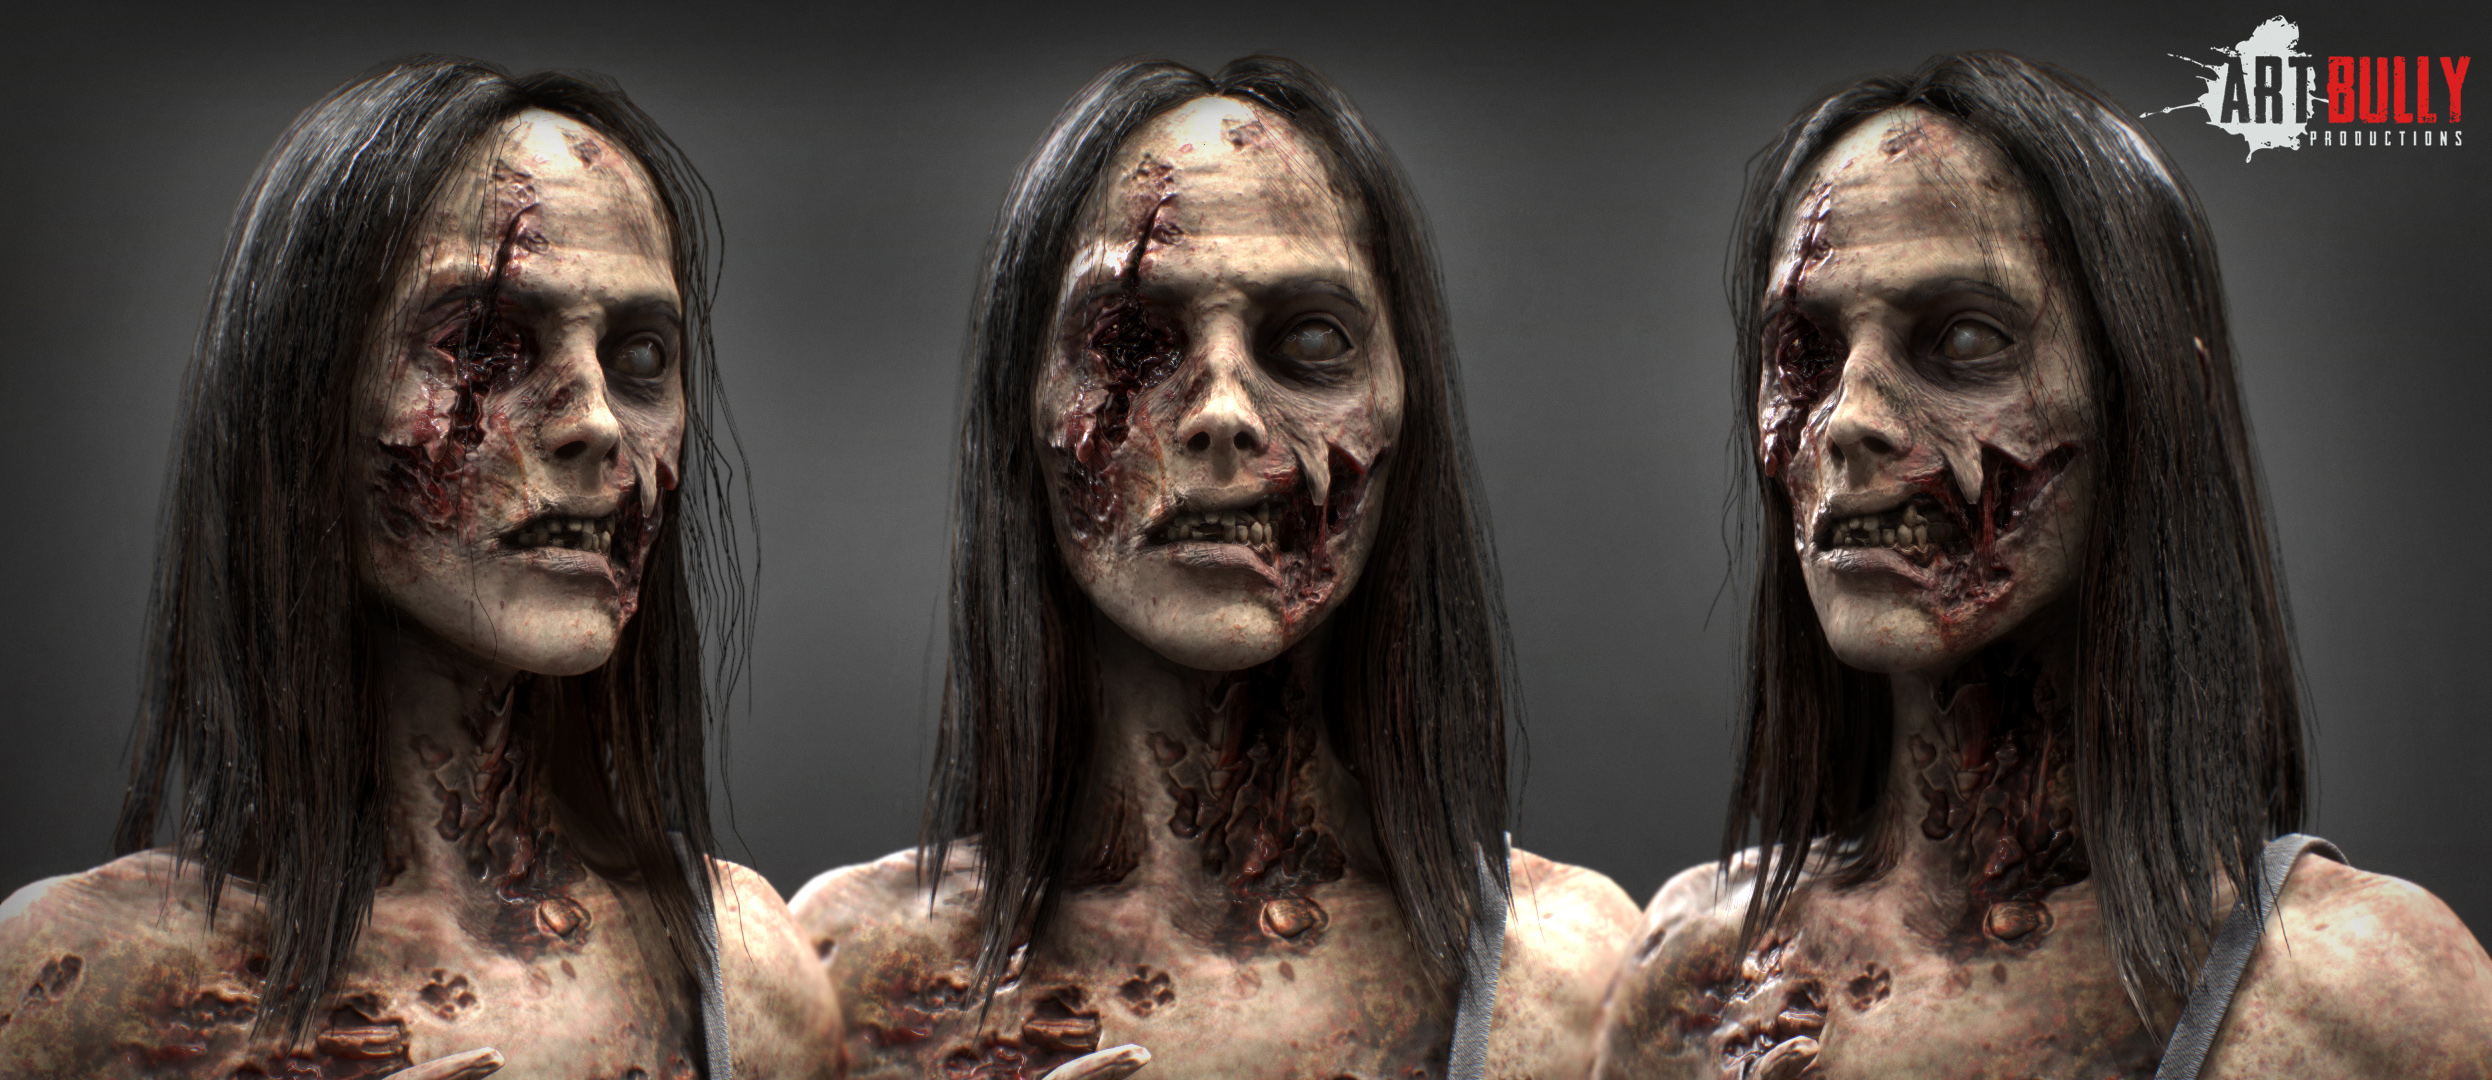 Female_Zombie_01_CU_01.jpg